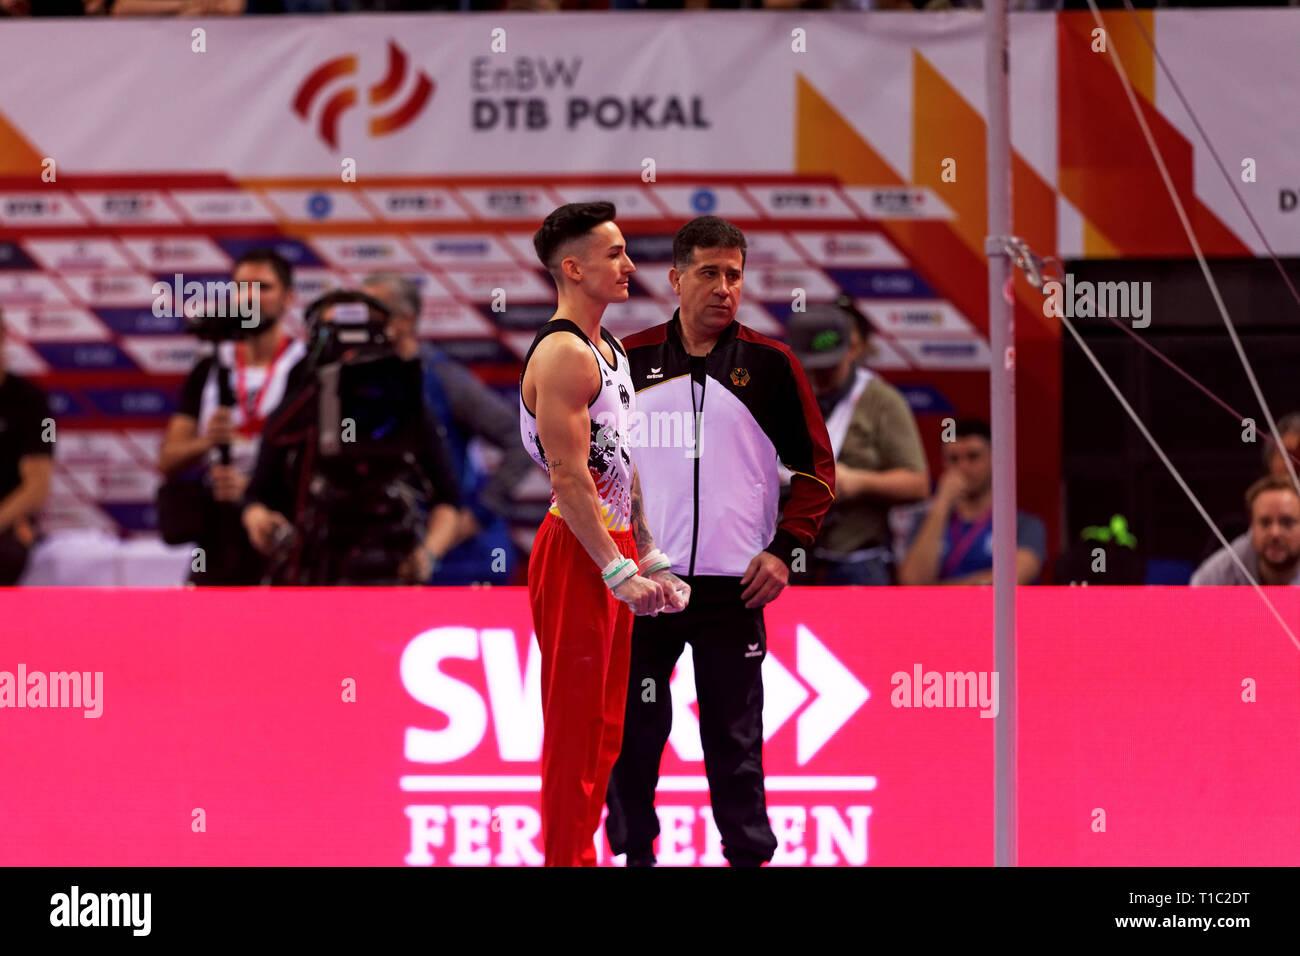 Marcel Nguyen, GER, EnBW DTB Pokal, Stuttgart 2019 - Stock Image